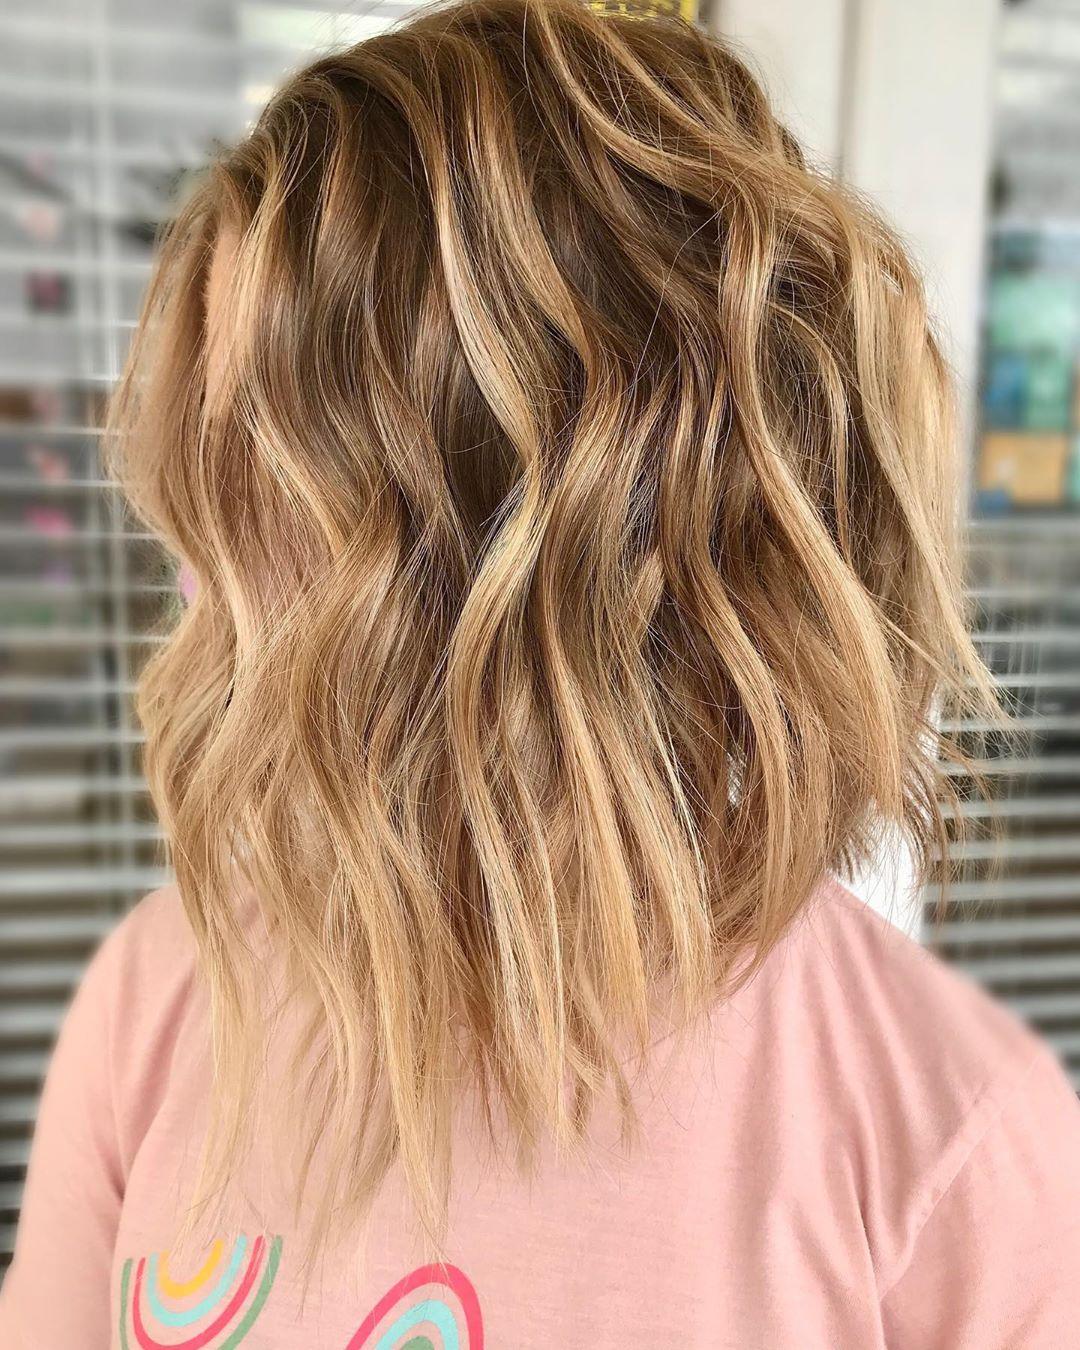 10 Medium Length Haircuts with Wavy Hair - Women Wavy Hair Styles 2021